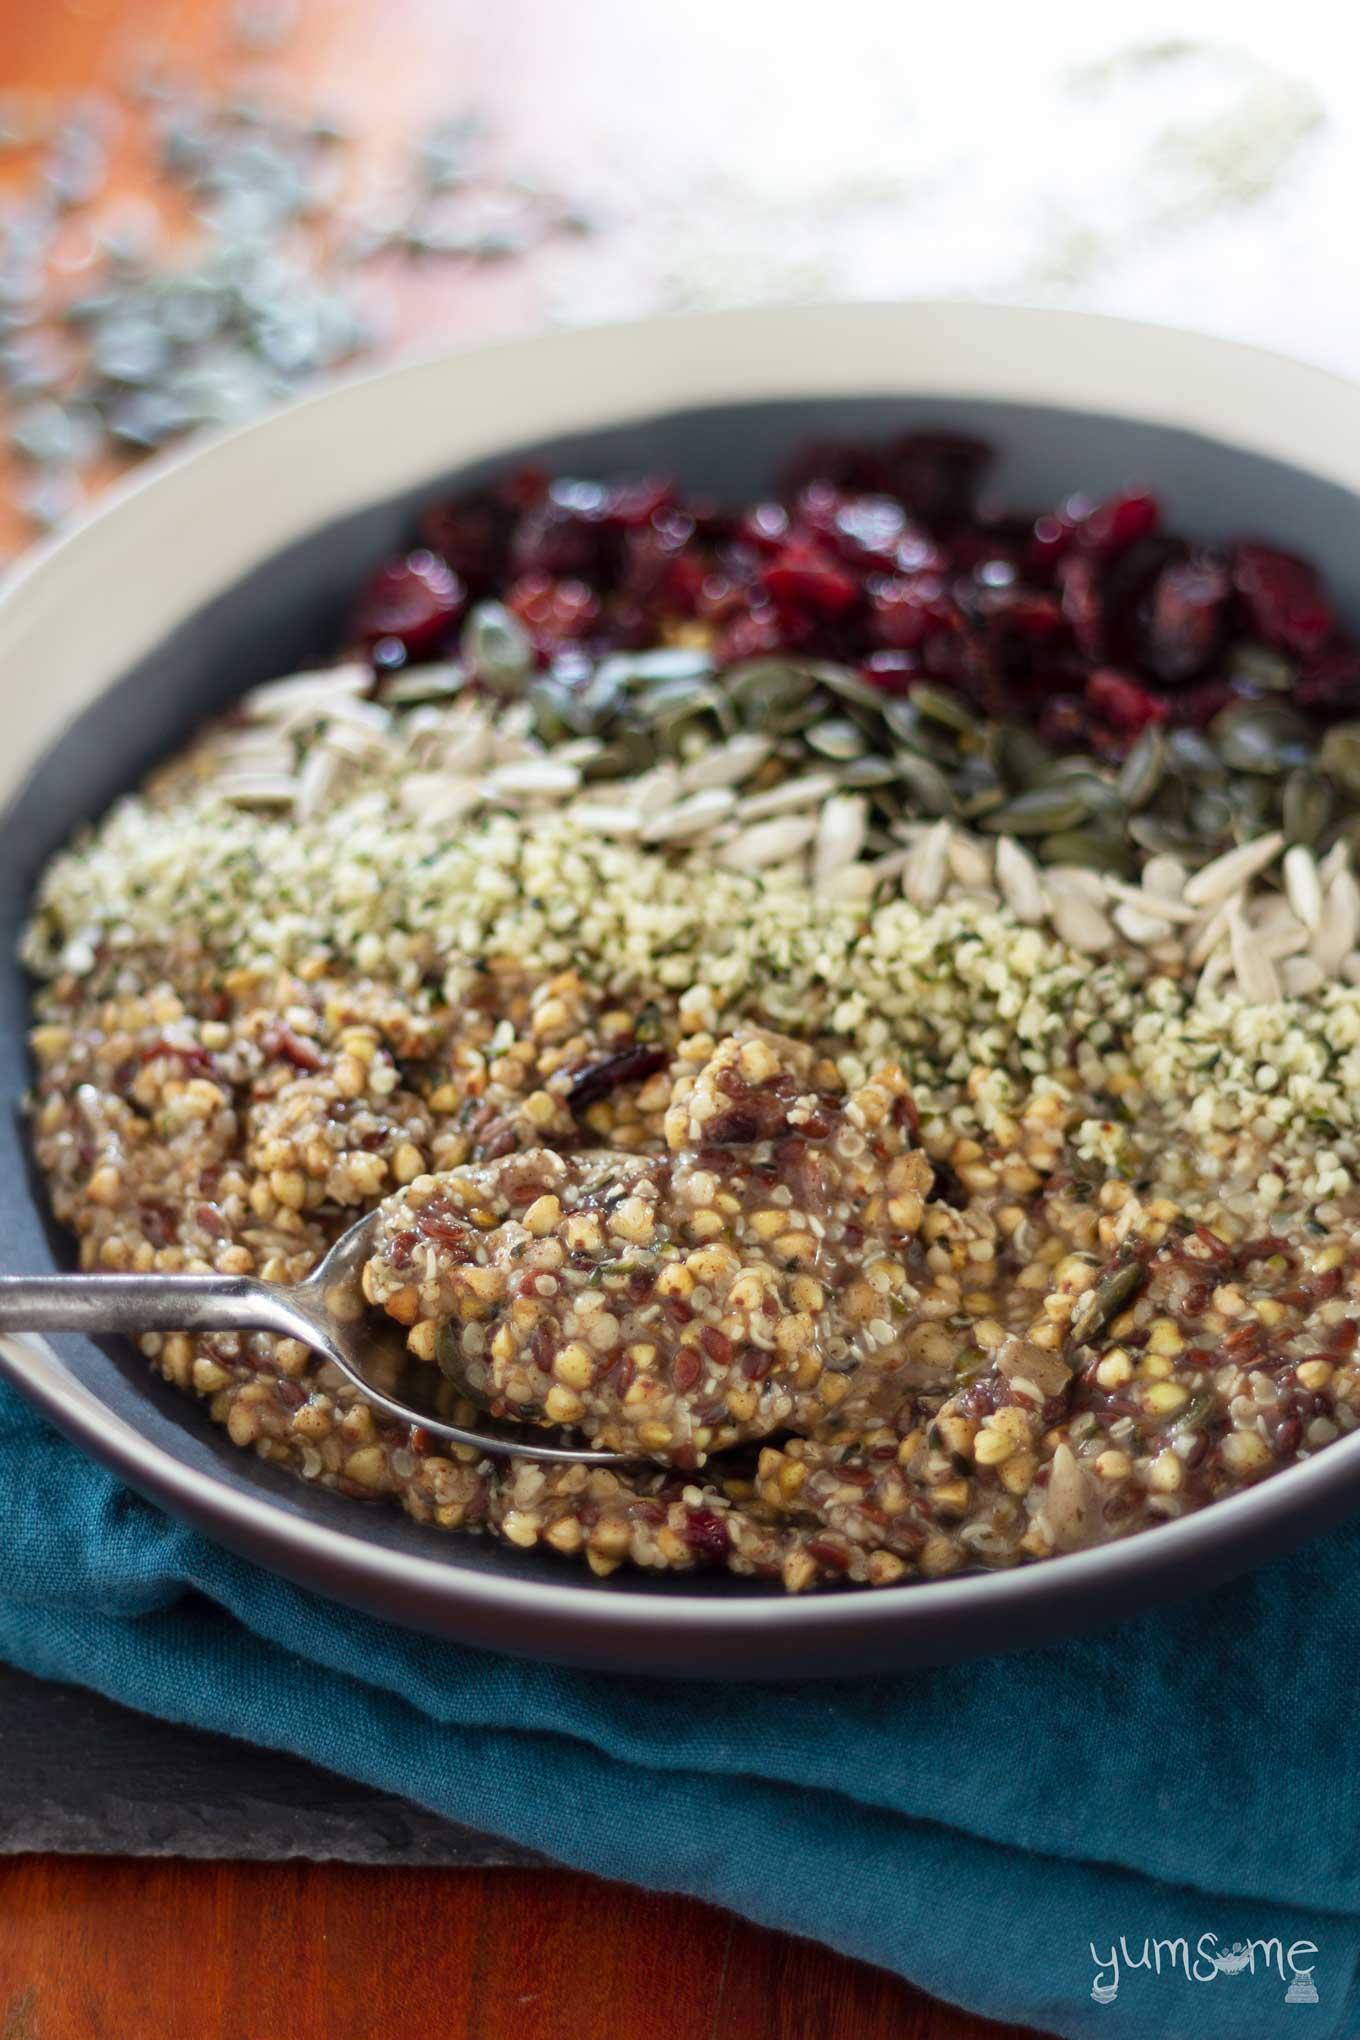 A shot of a bowl of vegan fruity hemp and buckwheat porridge on a blue napkin on a wooden table.